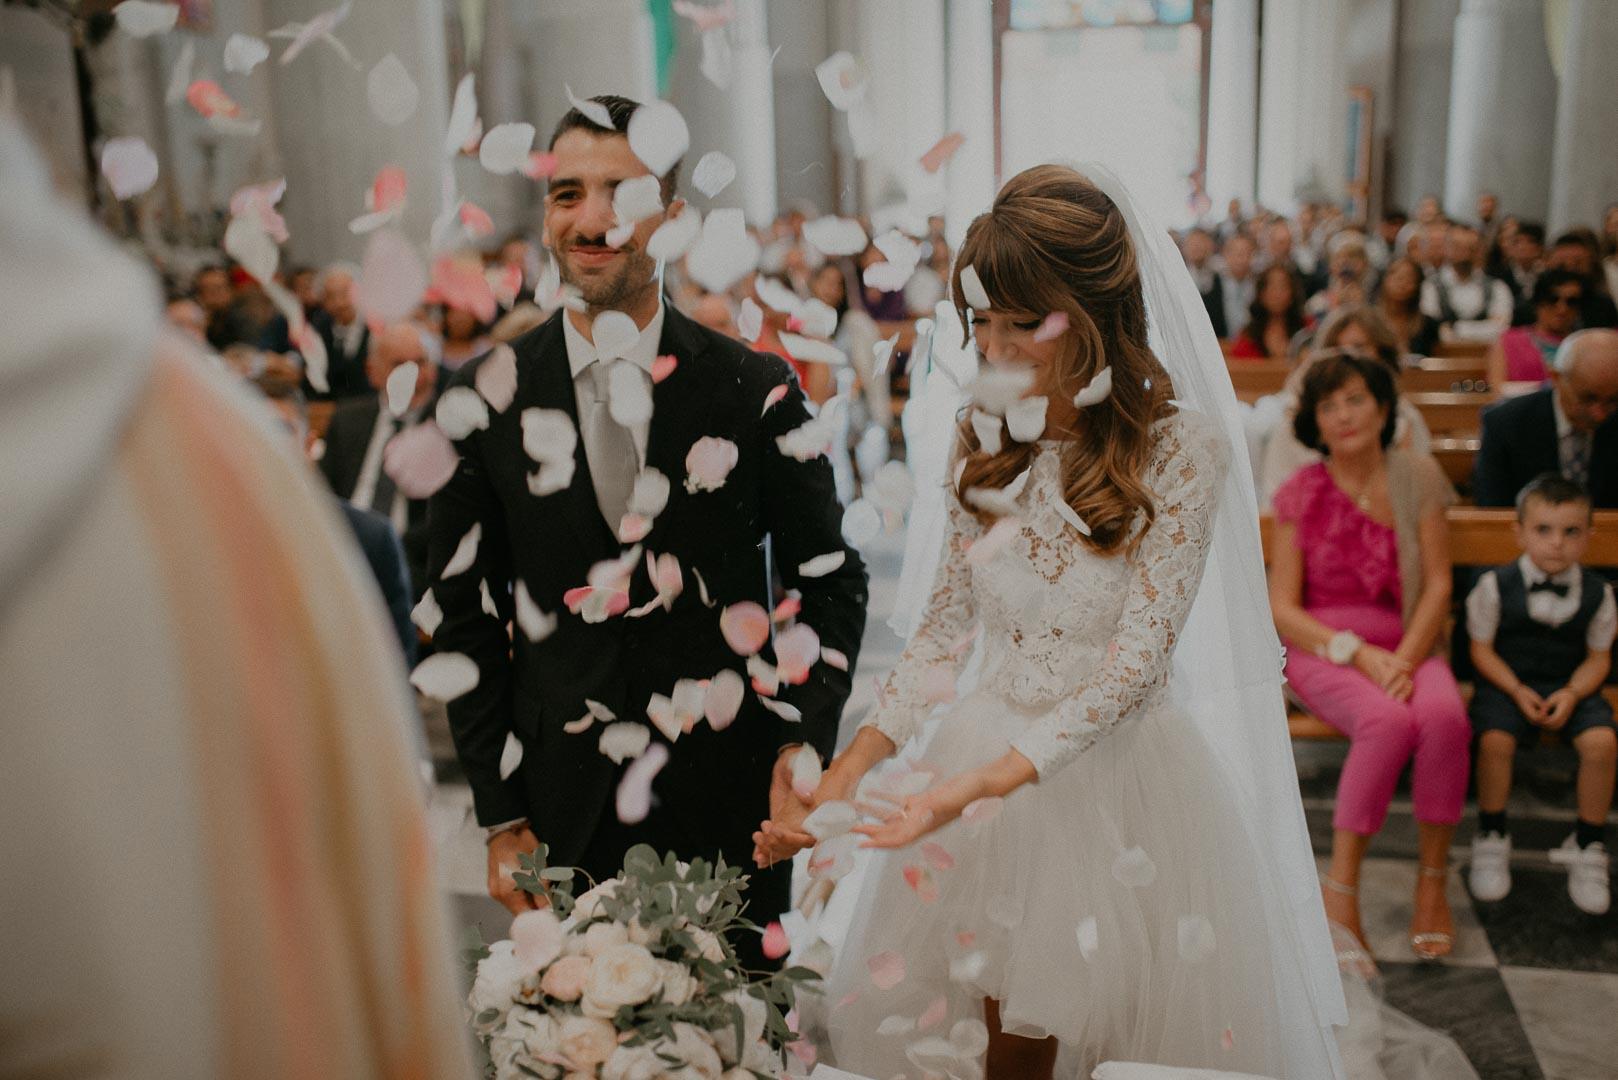 wedding-photographer-destination-fineart-bespoke-reportage-napoli-nabilah-vivianeizzo-spazio46-69